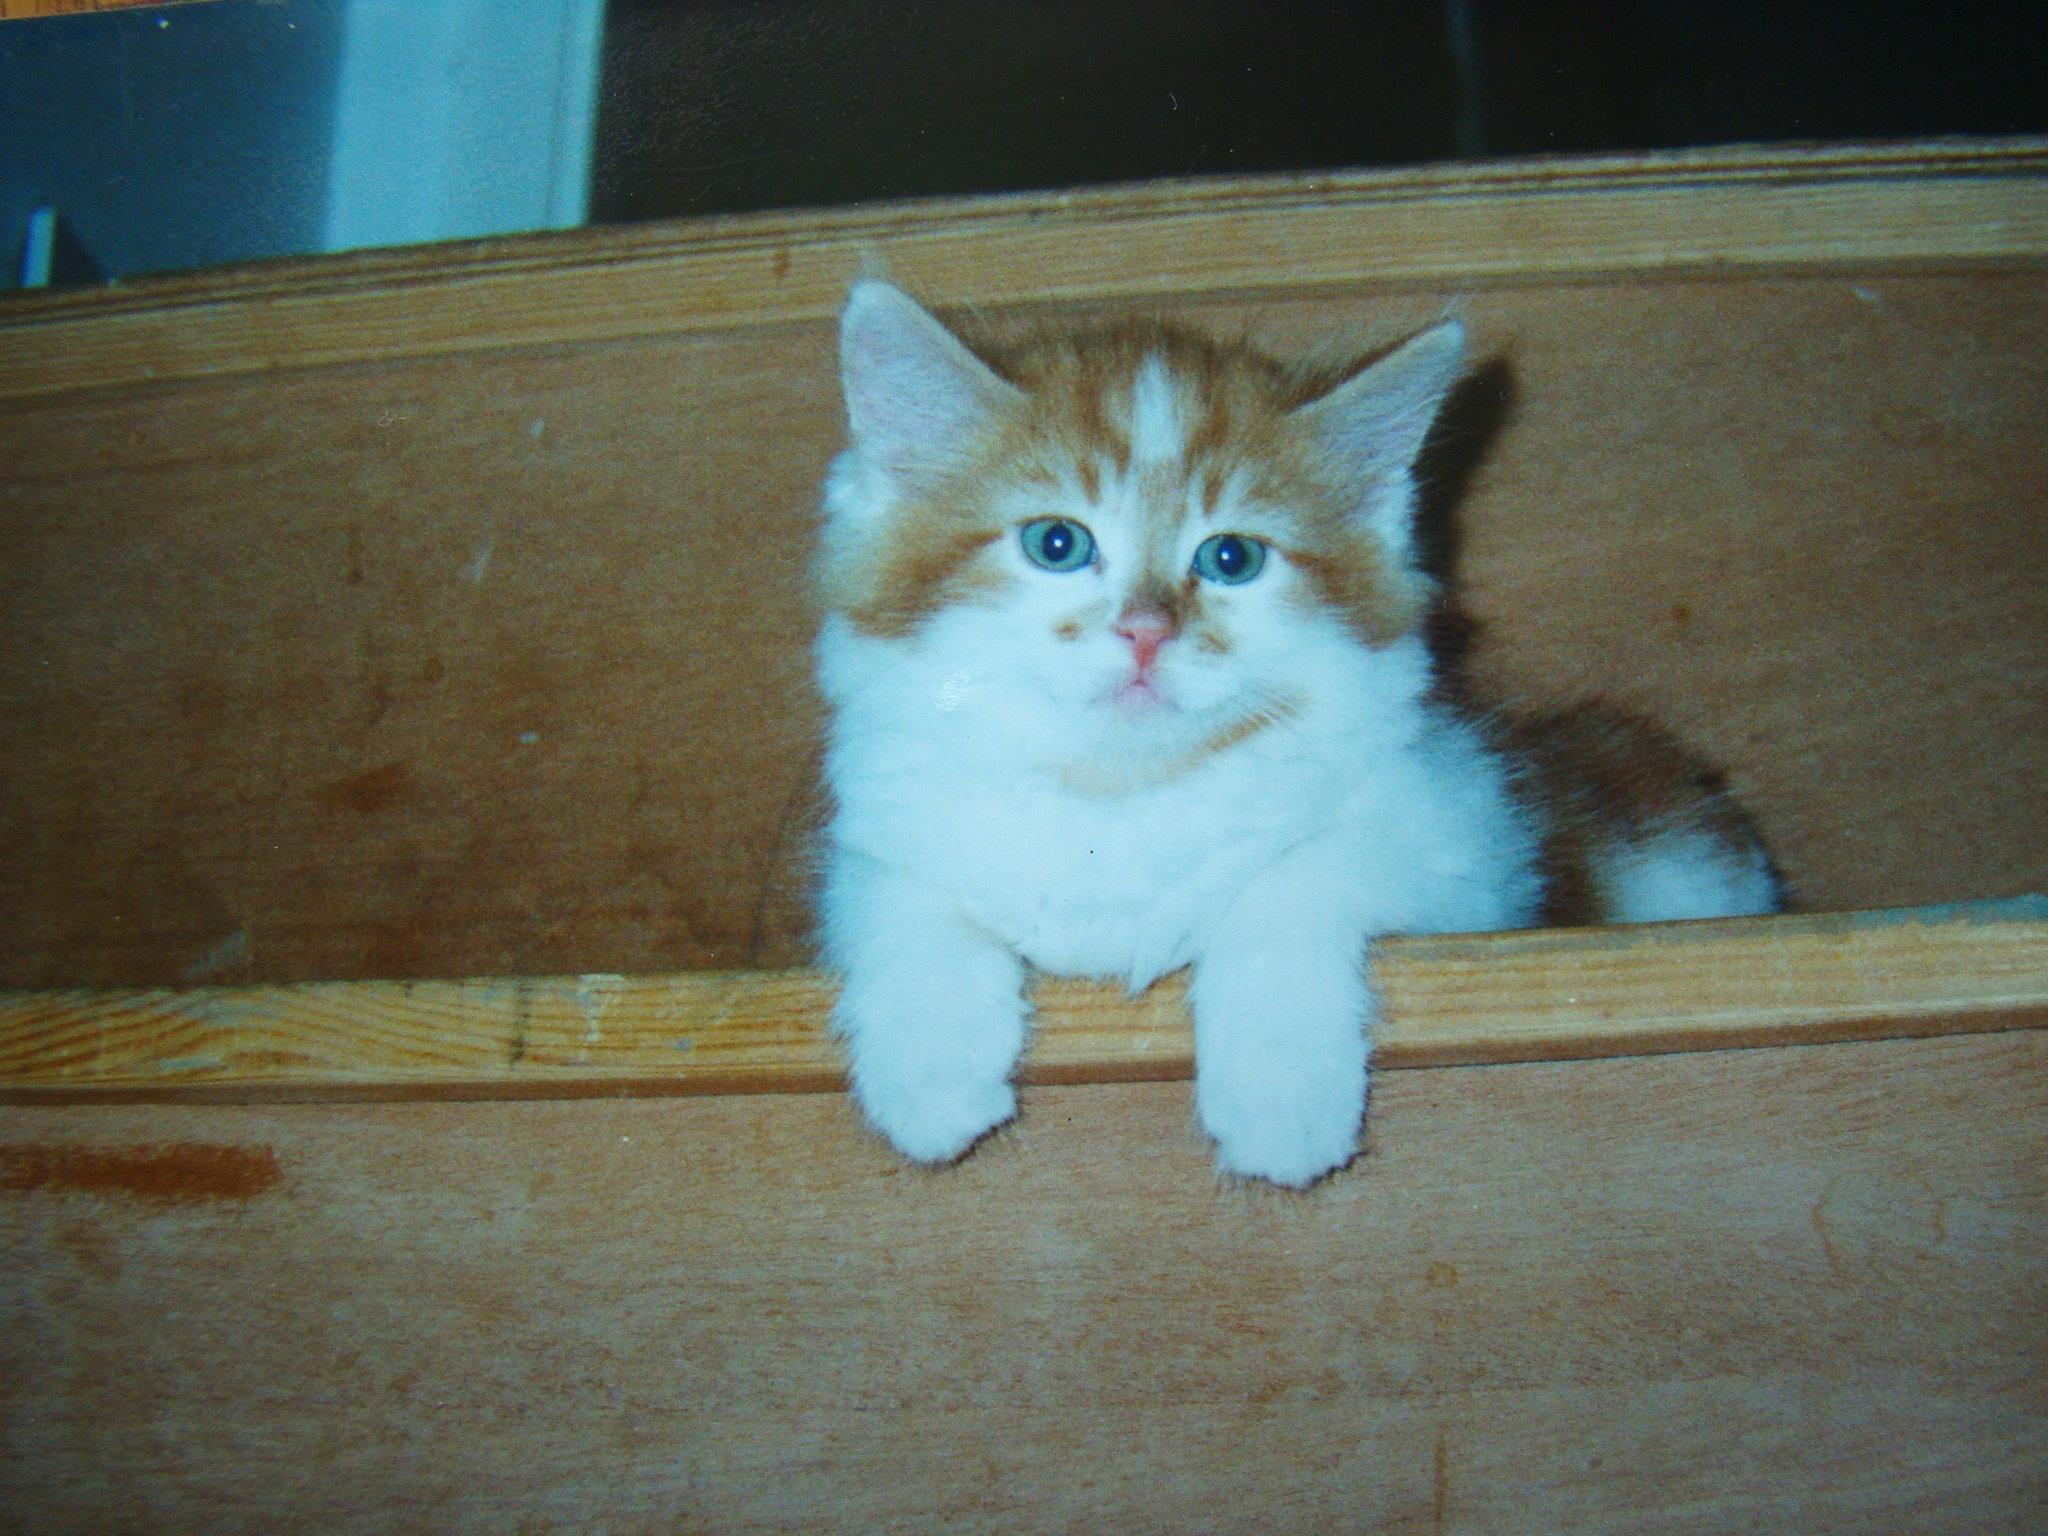 Mały kociak na schodach